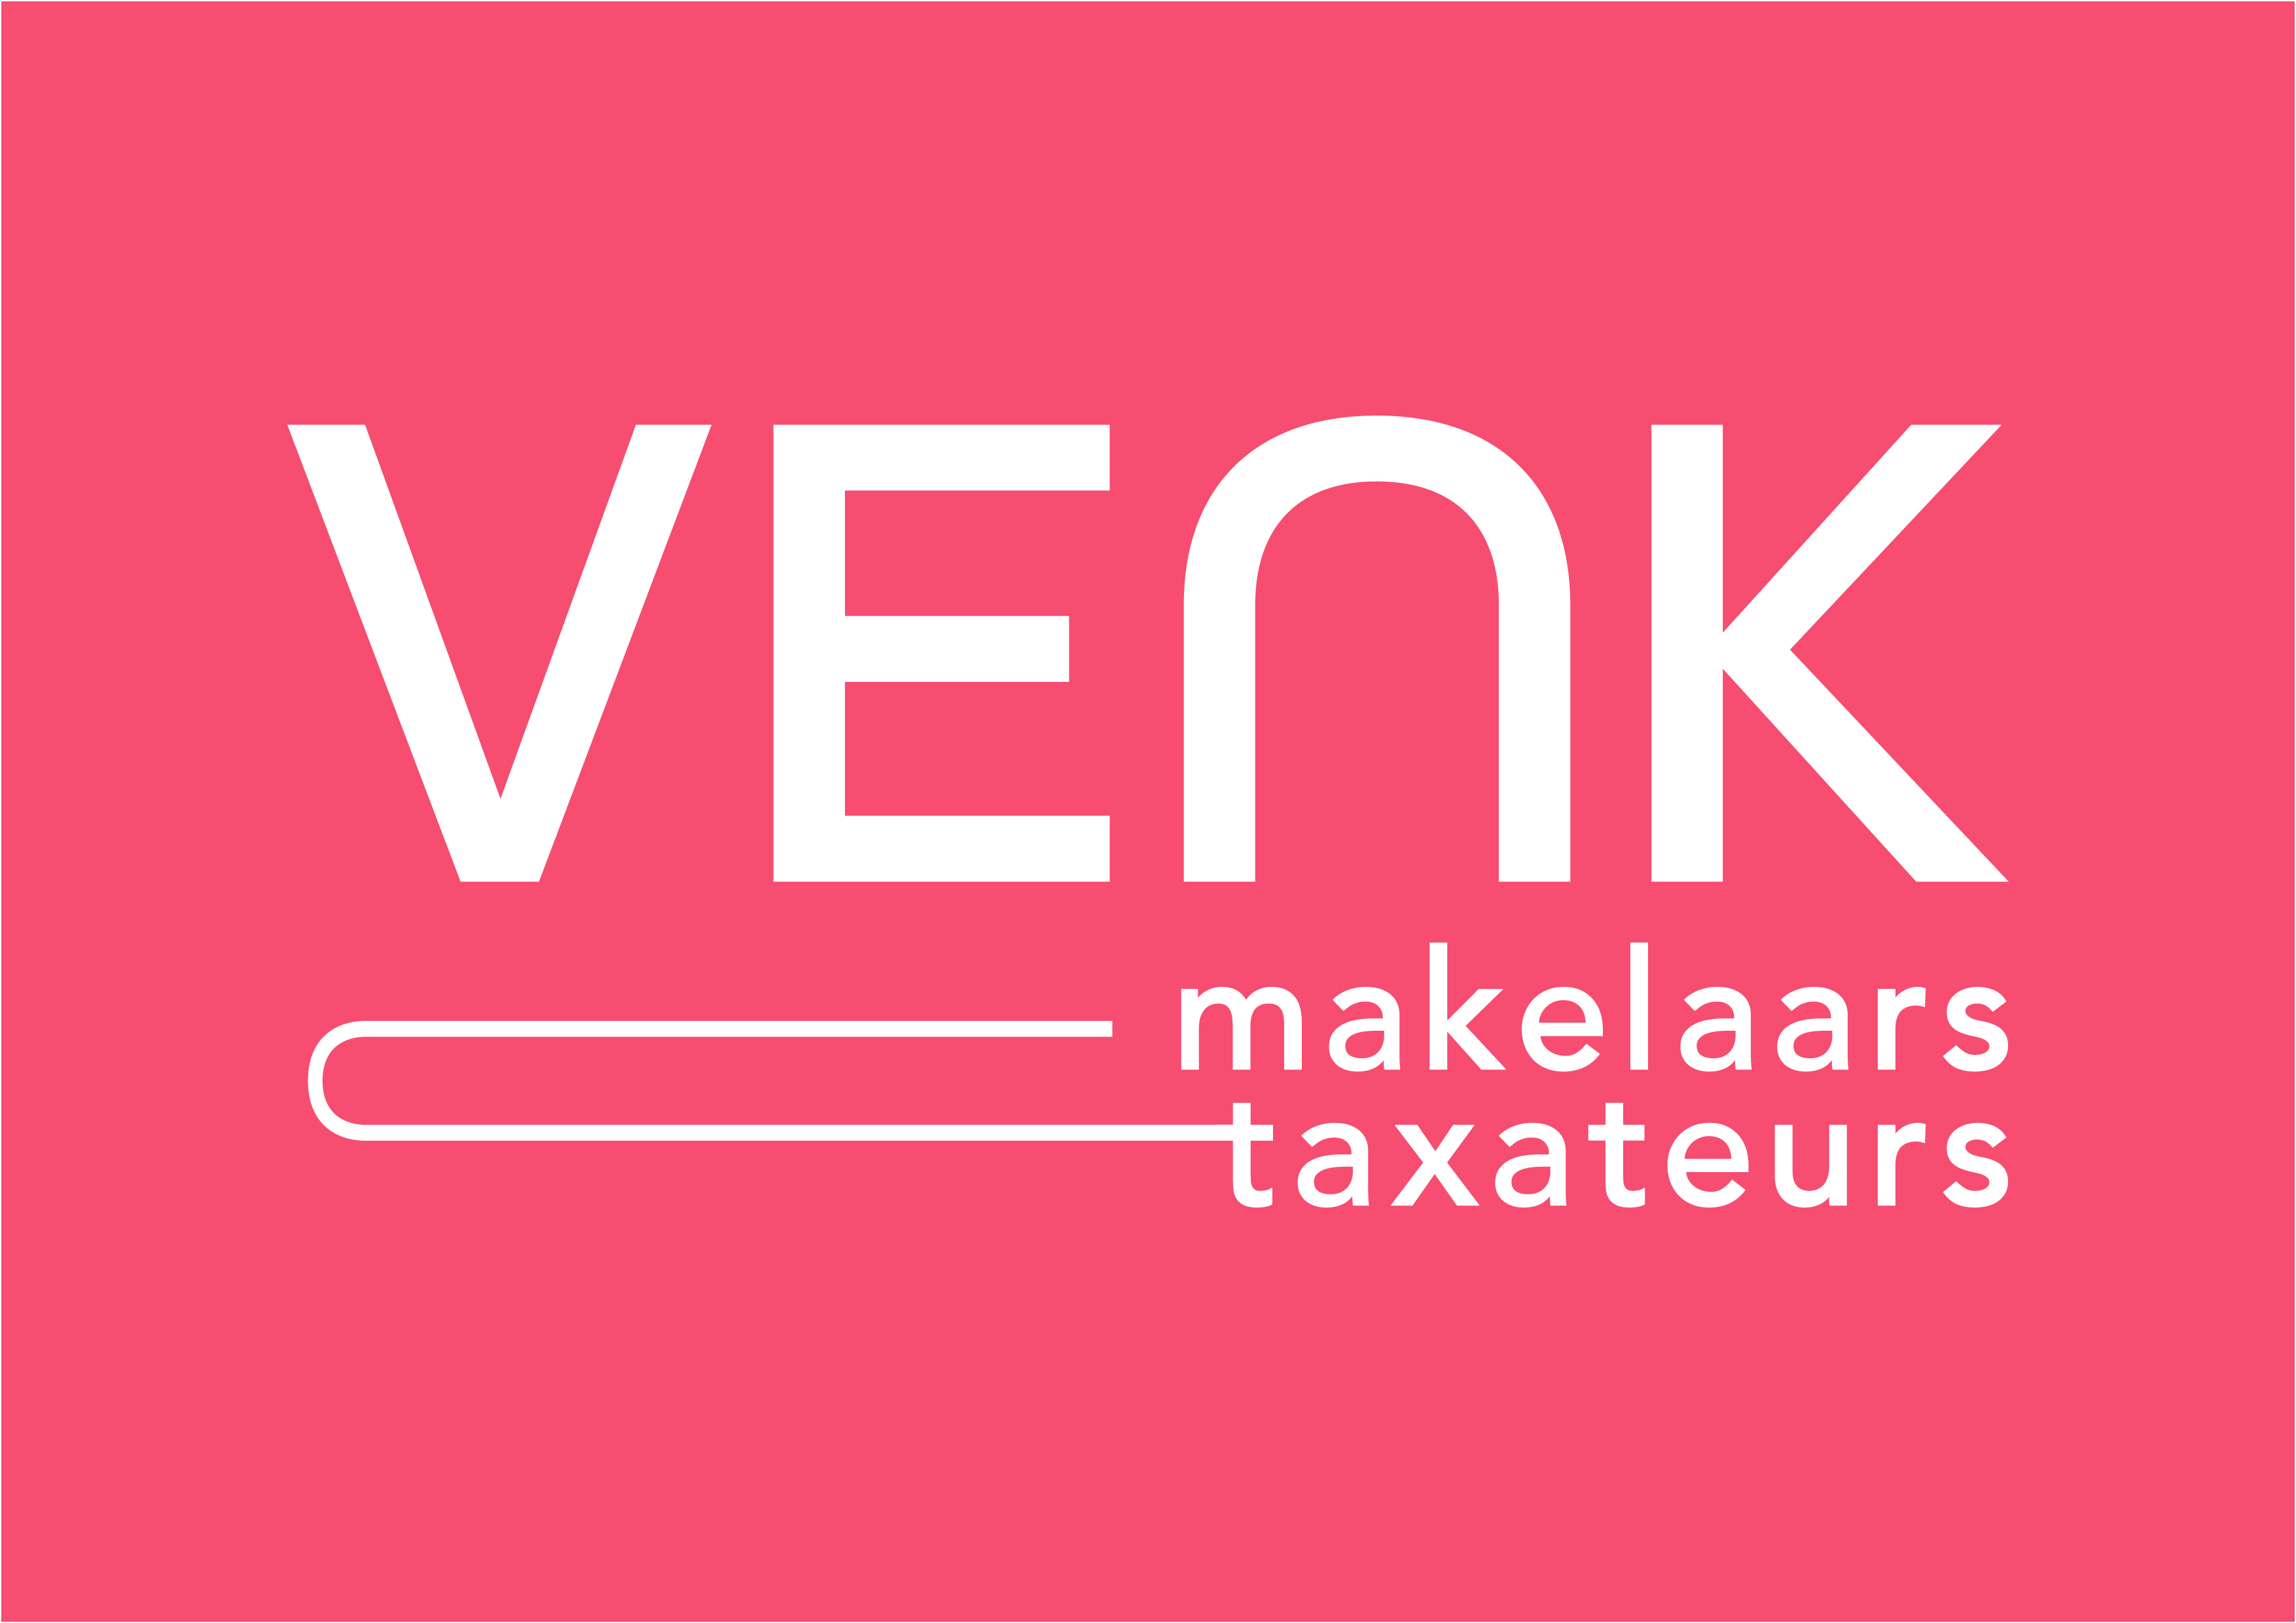 logo Velthaak & Keijzer Makelaars / Taxateurs o.g.